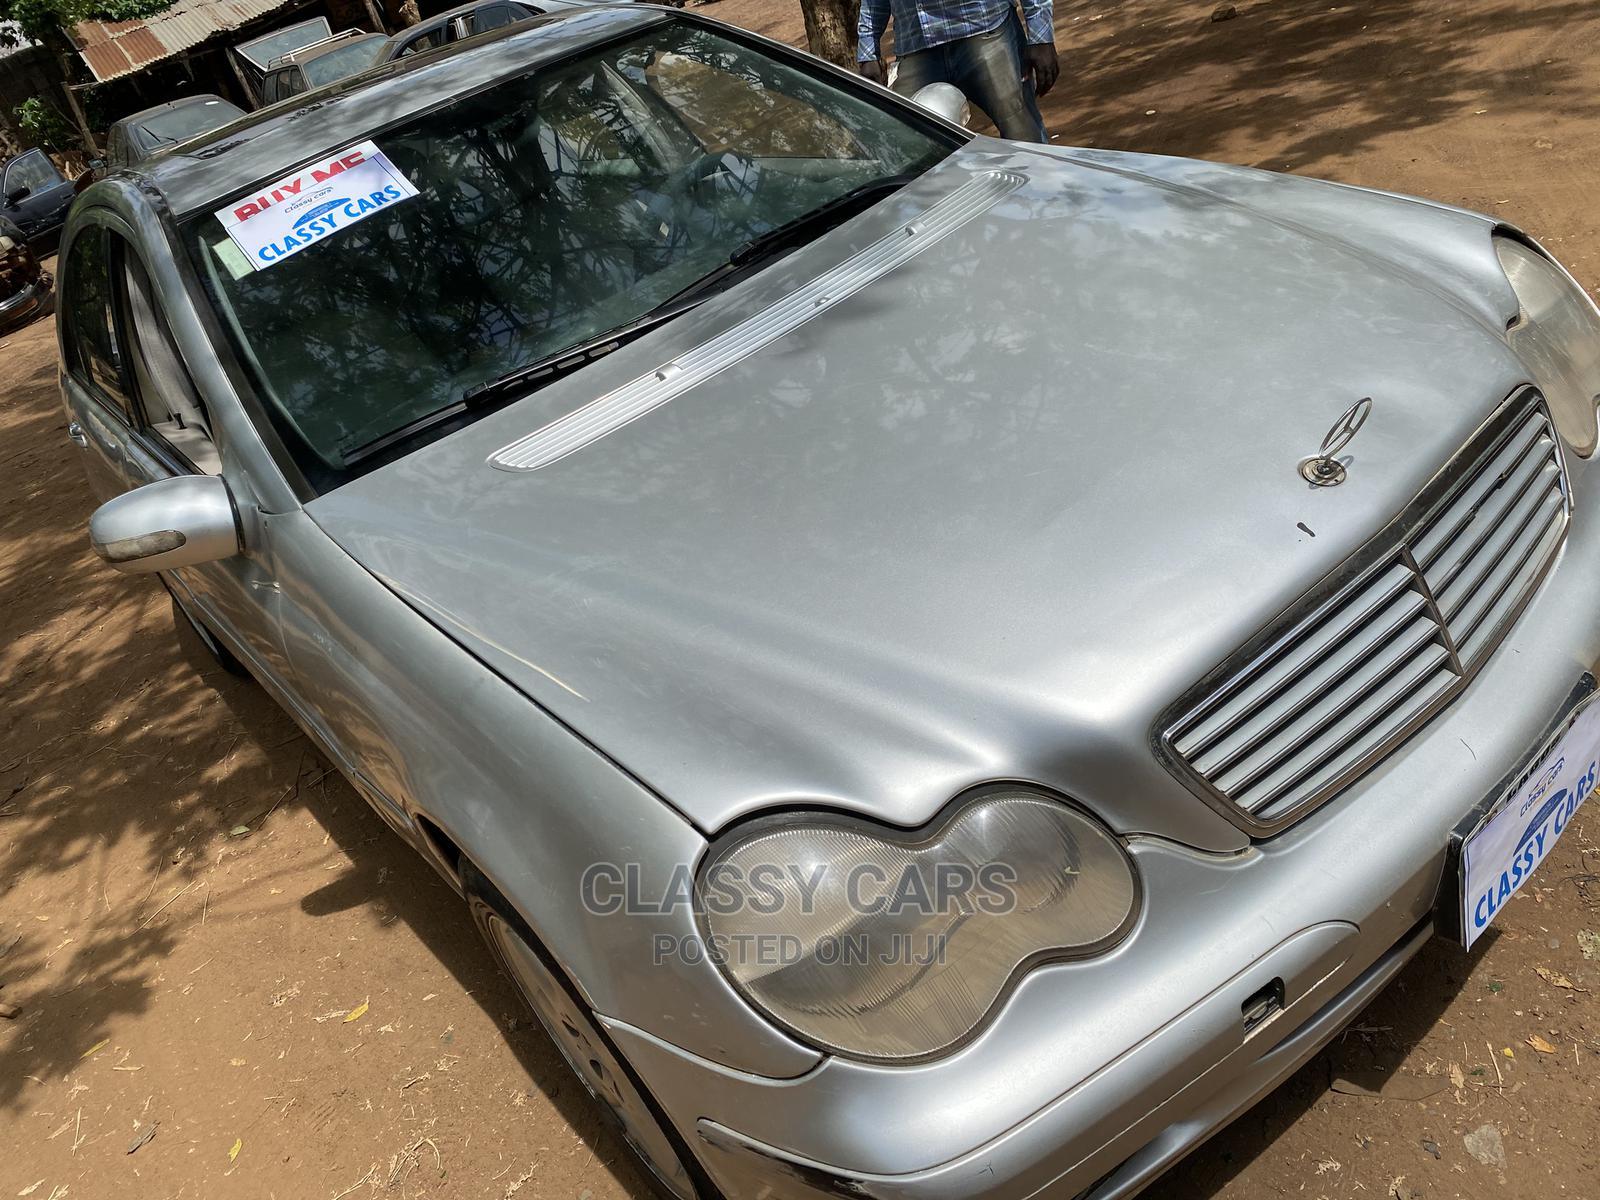 Mercedes-Benz C240 2003 Silver